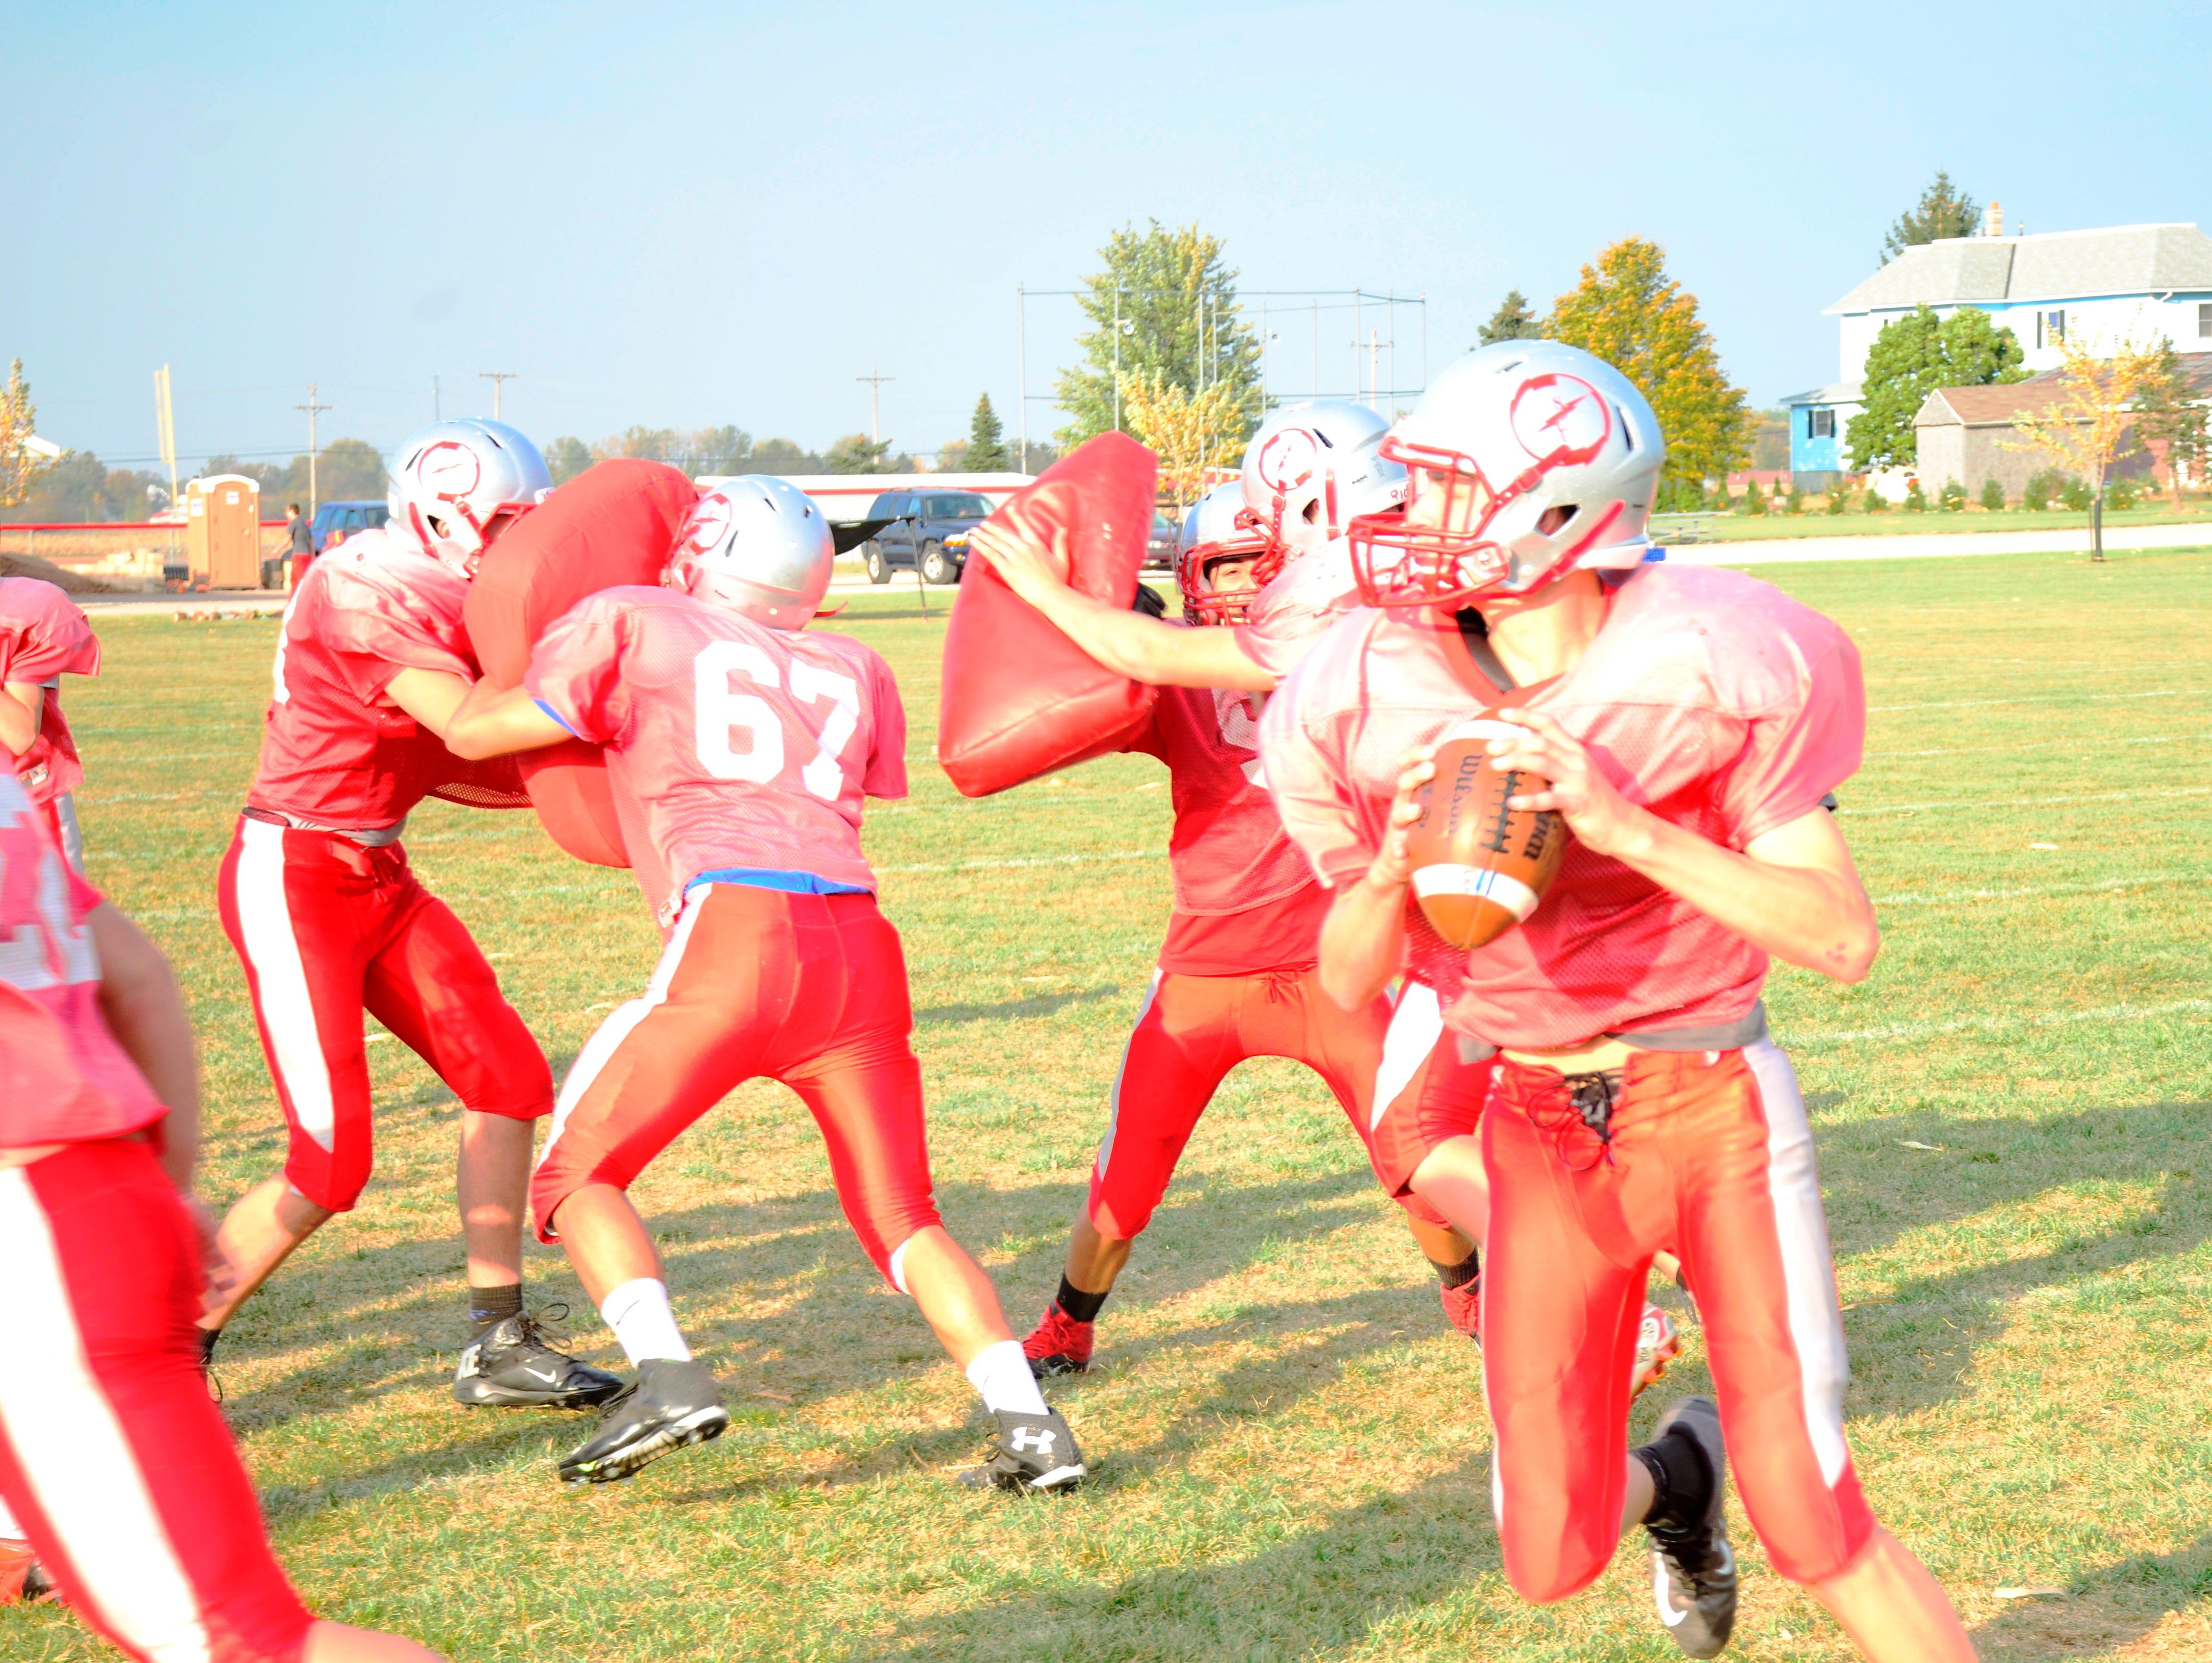 St. Joseph Central Catholic quarterback Spencer Harrison looks for an open receiver during the Crimson Streaks' practice Wednesday. SJCC will host Lakota at Don Paul Stadium Saturday.